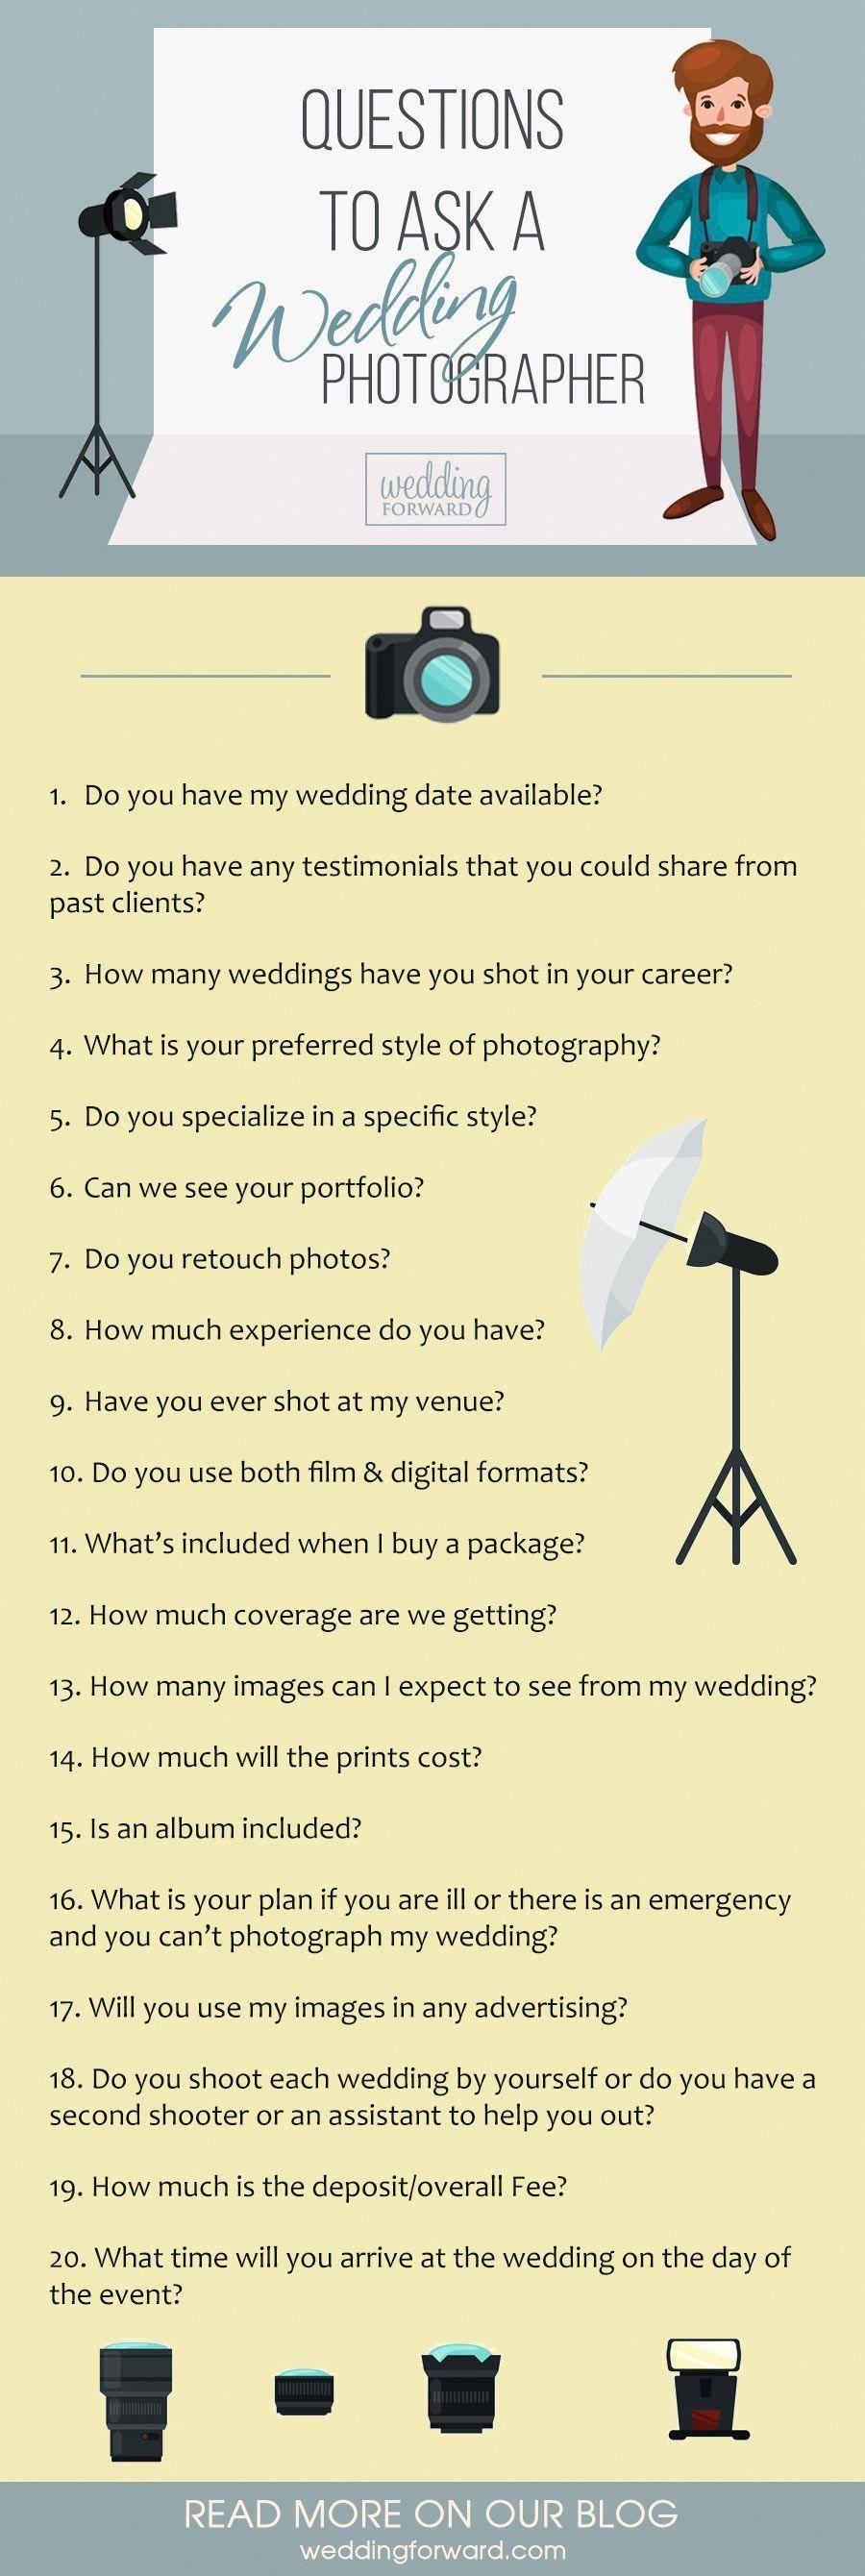 Average Wedding Photographer Cost 2020 Guide Wedding